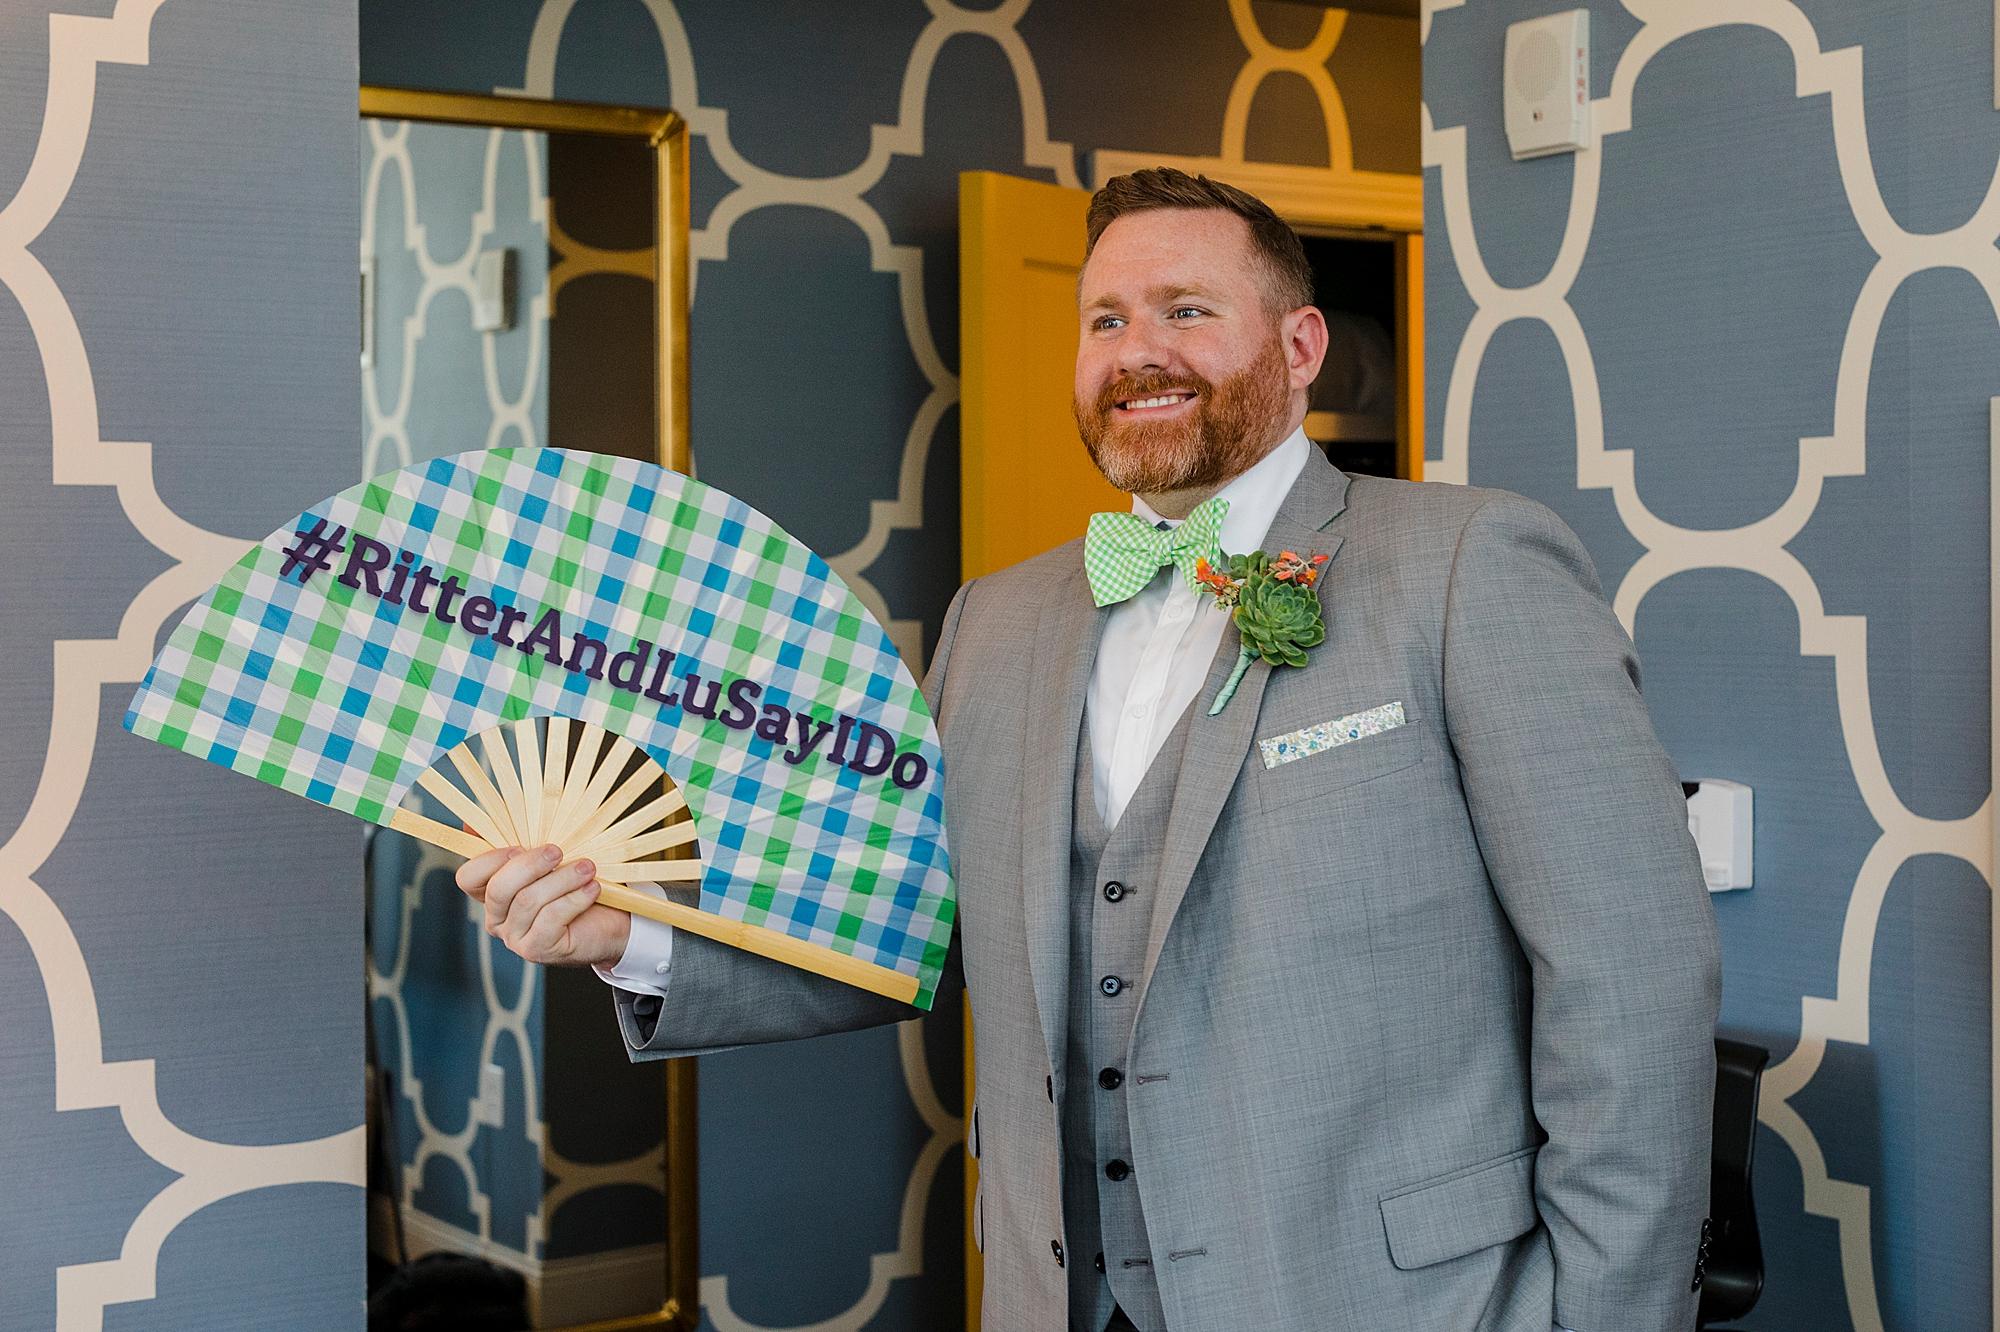 Dan_and_Byron_Love_by_Joe_Mac_Philadelphia_Wedding_LGBTQ_Photography_Gay_Independence_visitor_Center_21.JPG